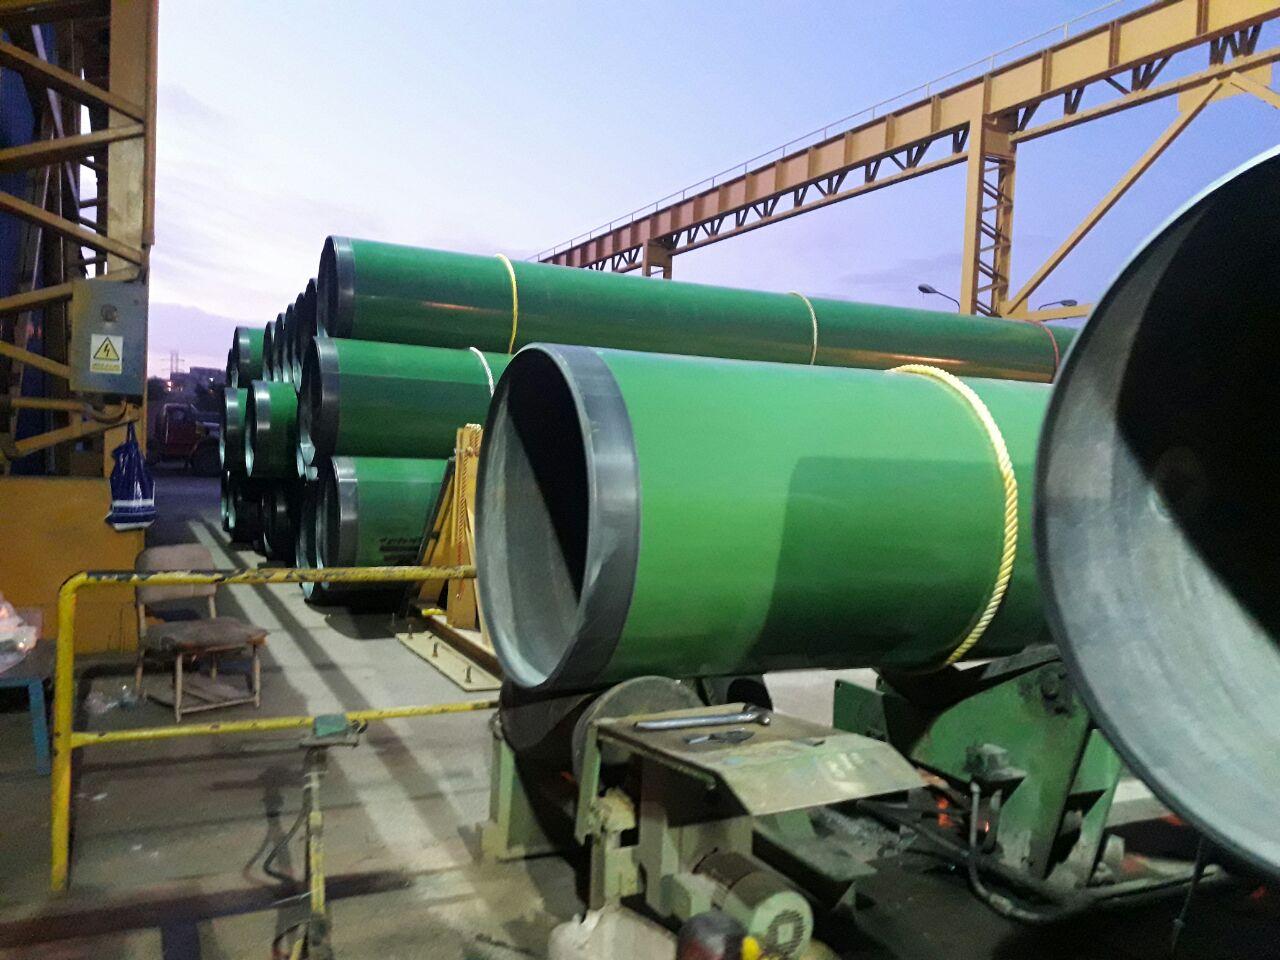 IMG 20200502 063839 186 شرکت لولهسازی اهواز در سال جهش تولید ظرفیت همکاری با صنایع را افزایش داد